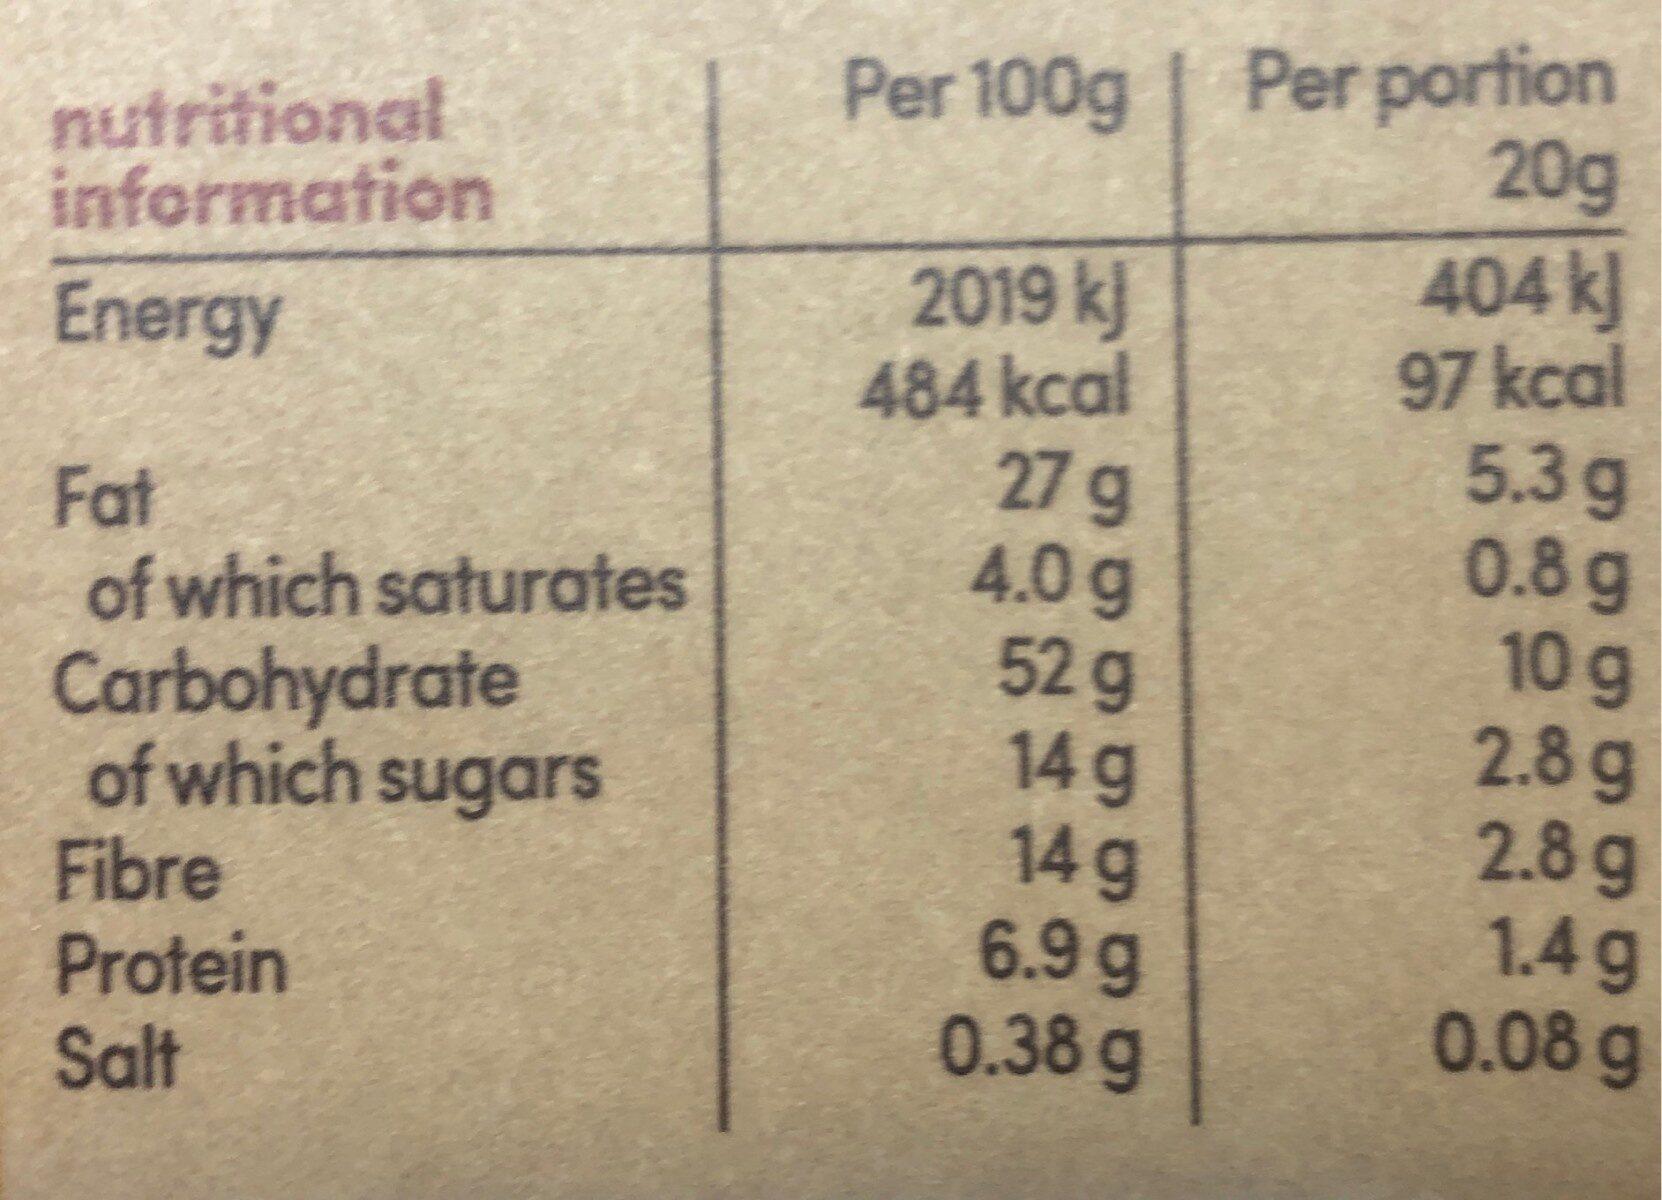 Lemon Drizzle Wow Bakes - Nutrition facts